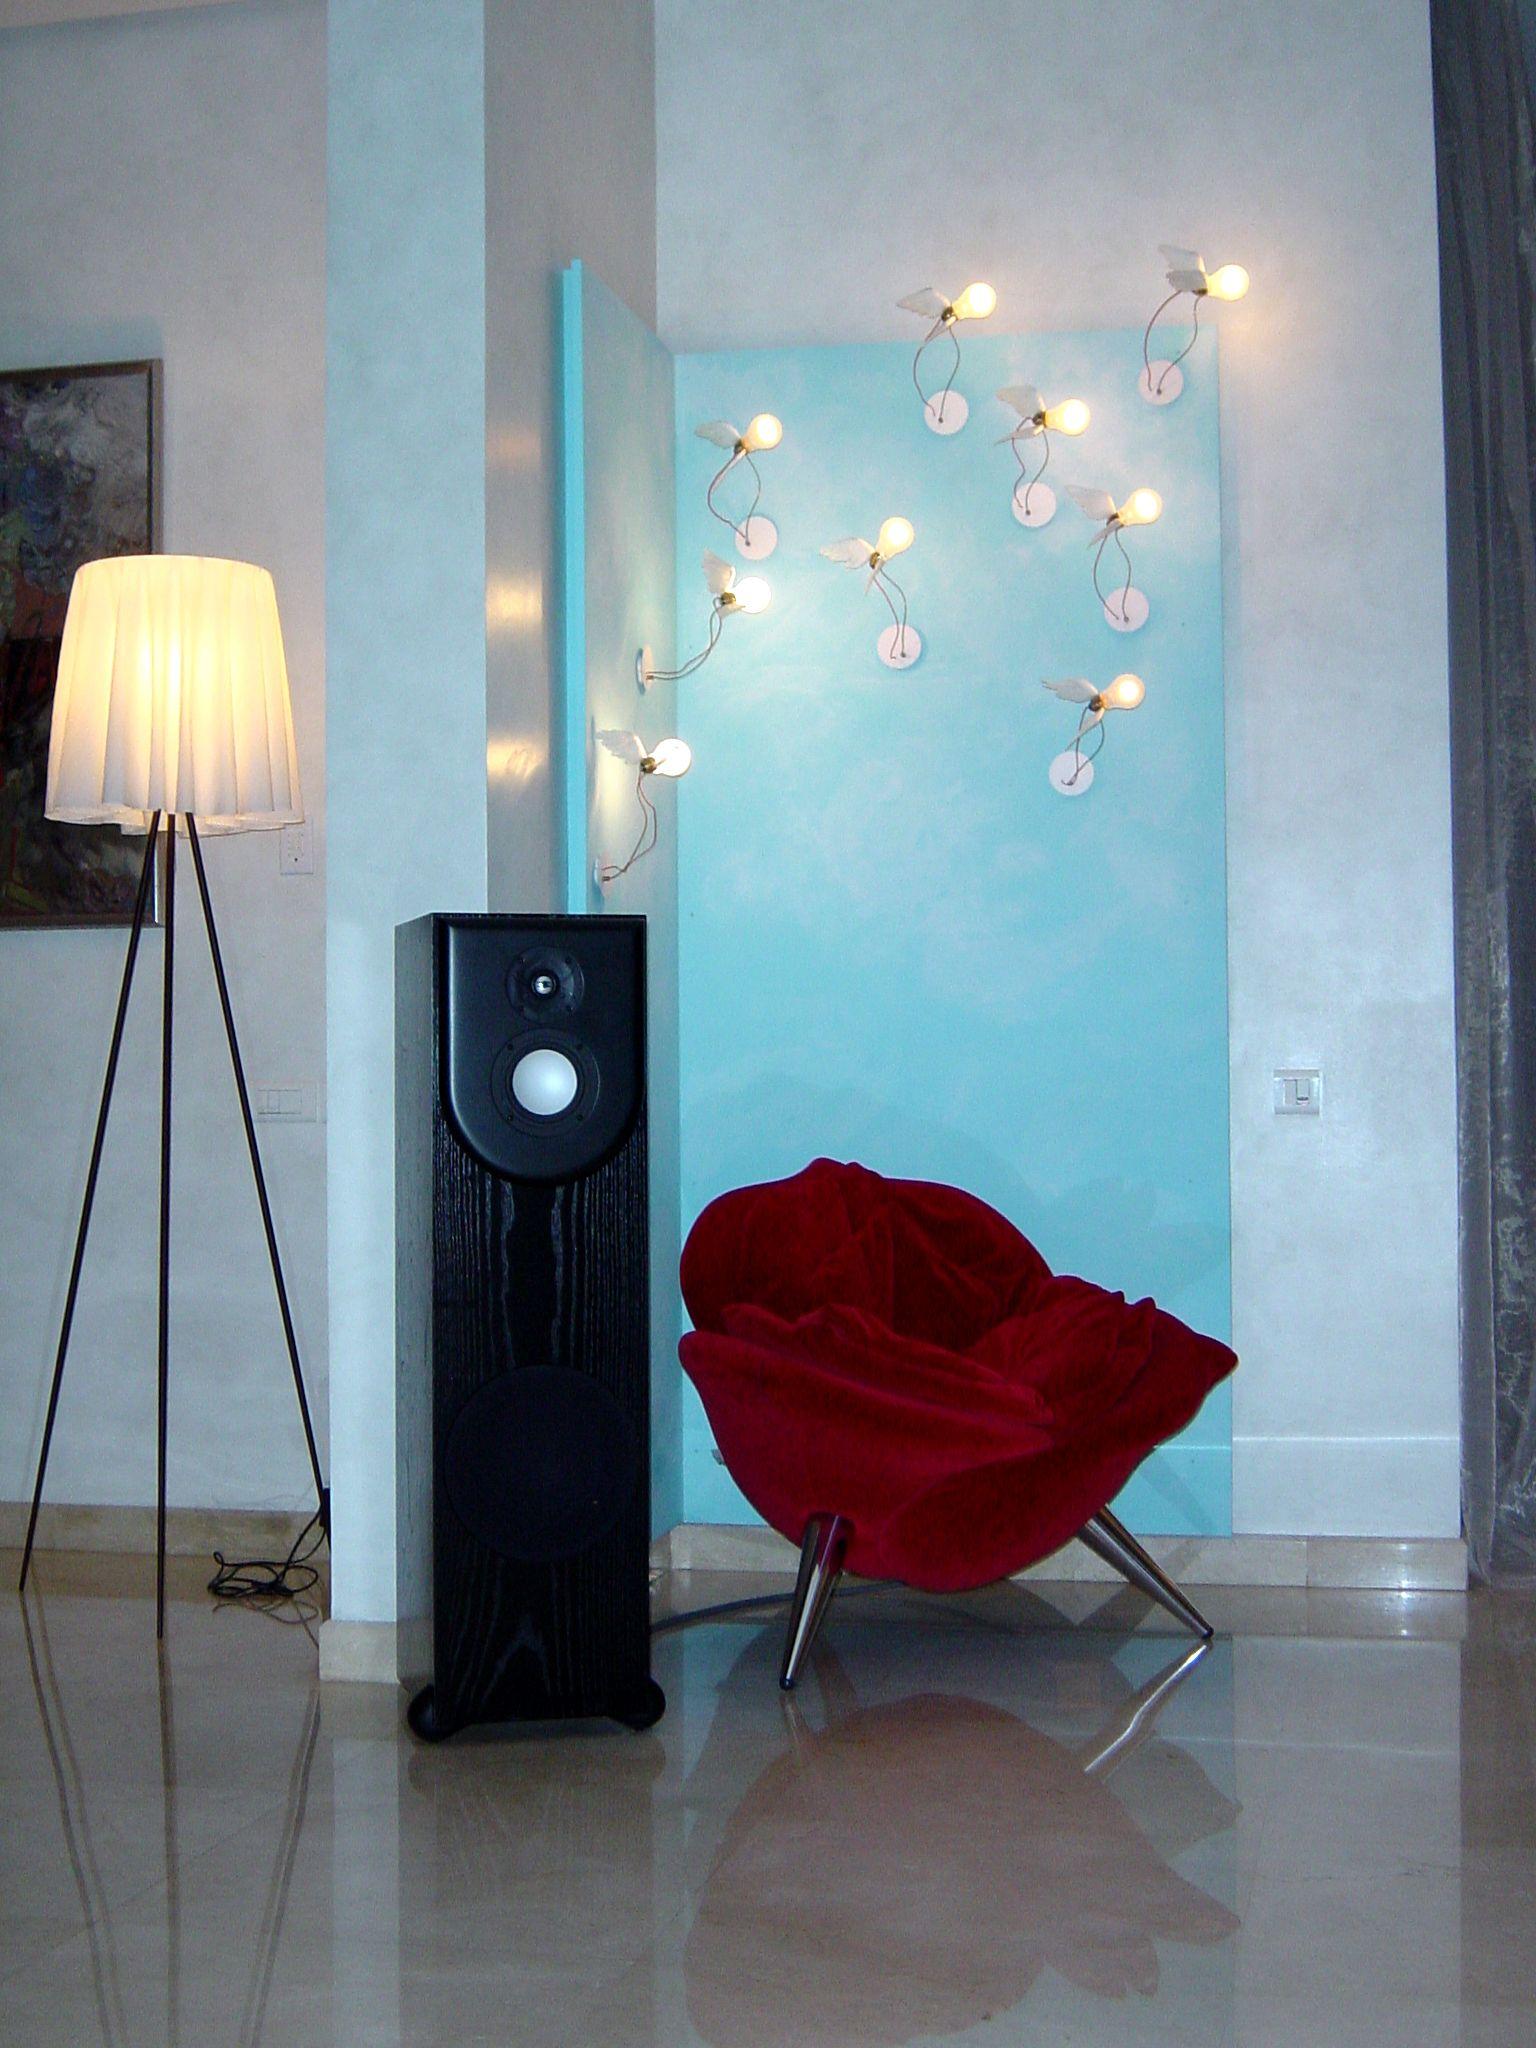 Installation multiroom, distribution Russound Cav 6.6, ampli de puissance Proceed, enceintes Revel Performa. Installation Movie Store Cedric Arnaud-Bour Paris France.@asgalerie #asgalerie #Revel #Proceed #Russound #Amx #Lutron.